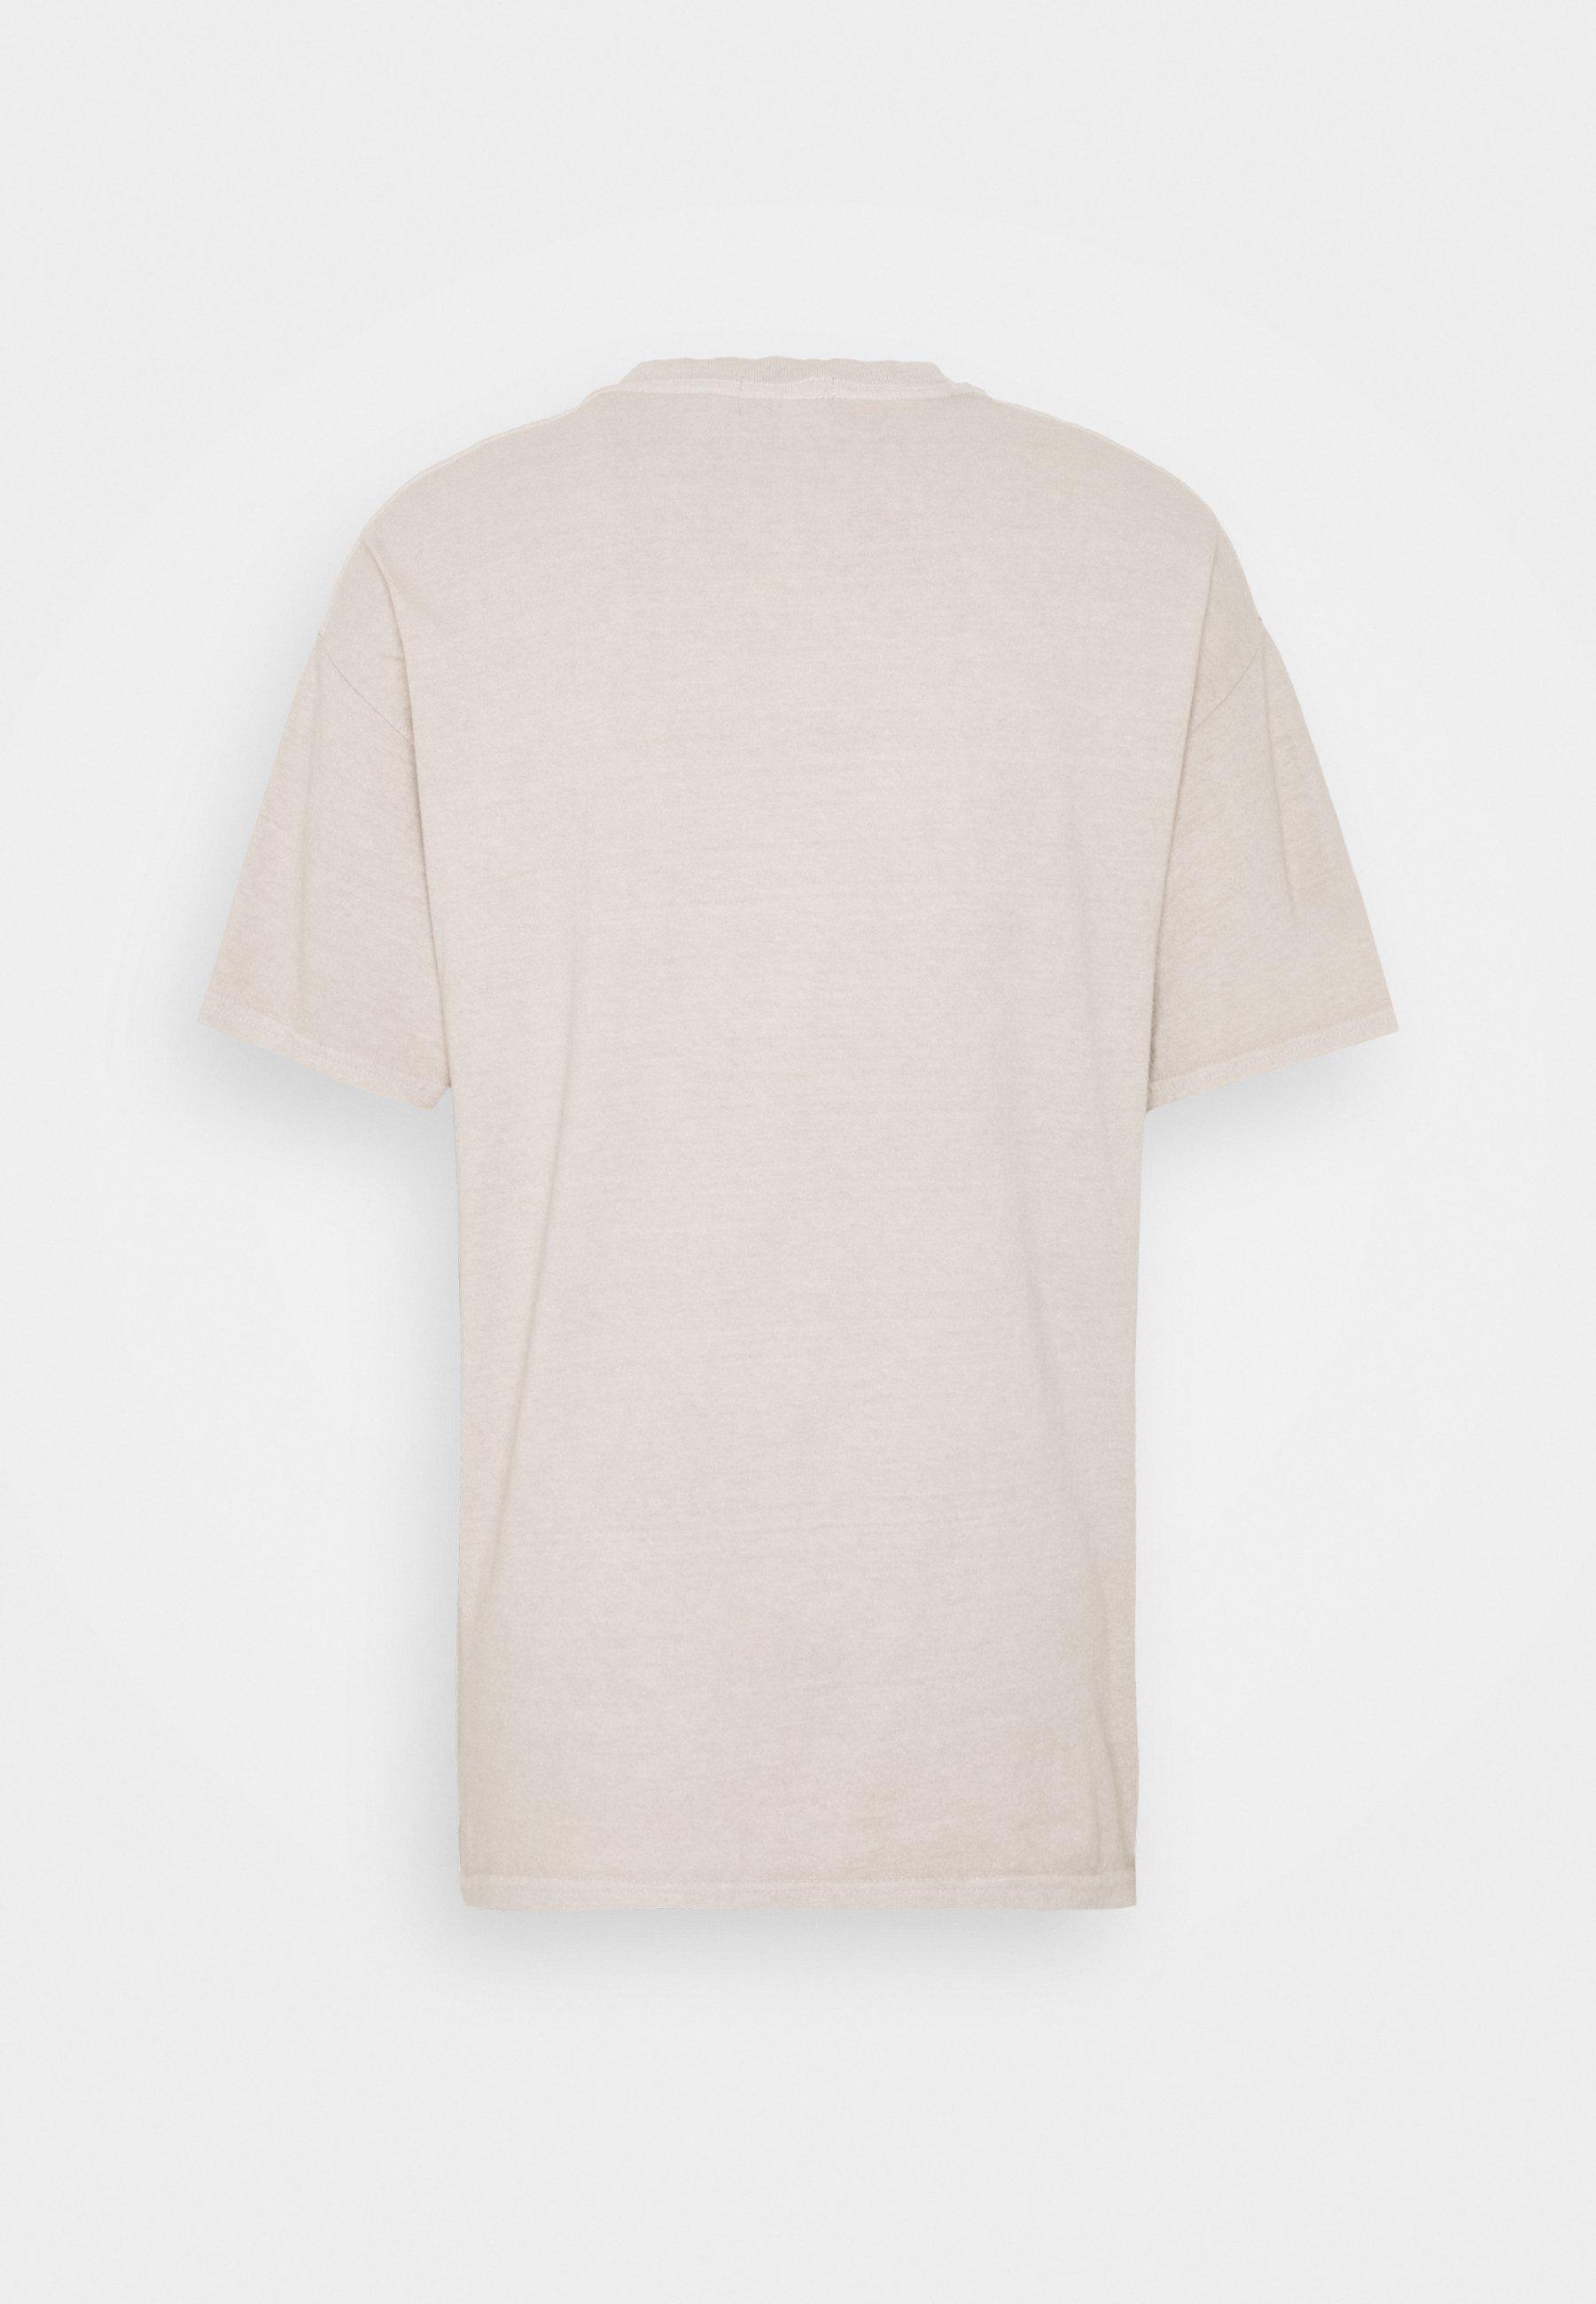 Topman Paris Heritage Tee - T-shirts Med Print Stone/stein